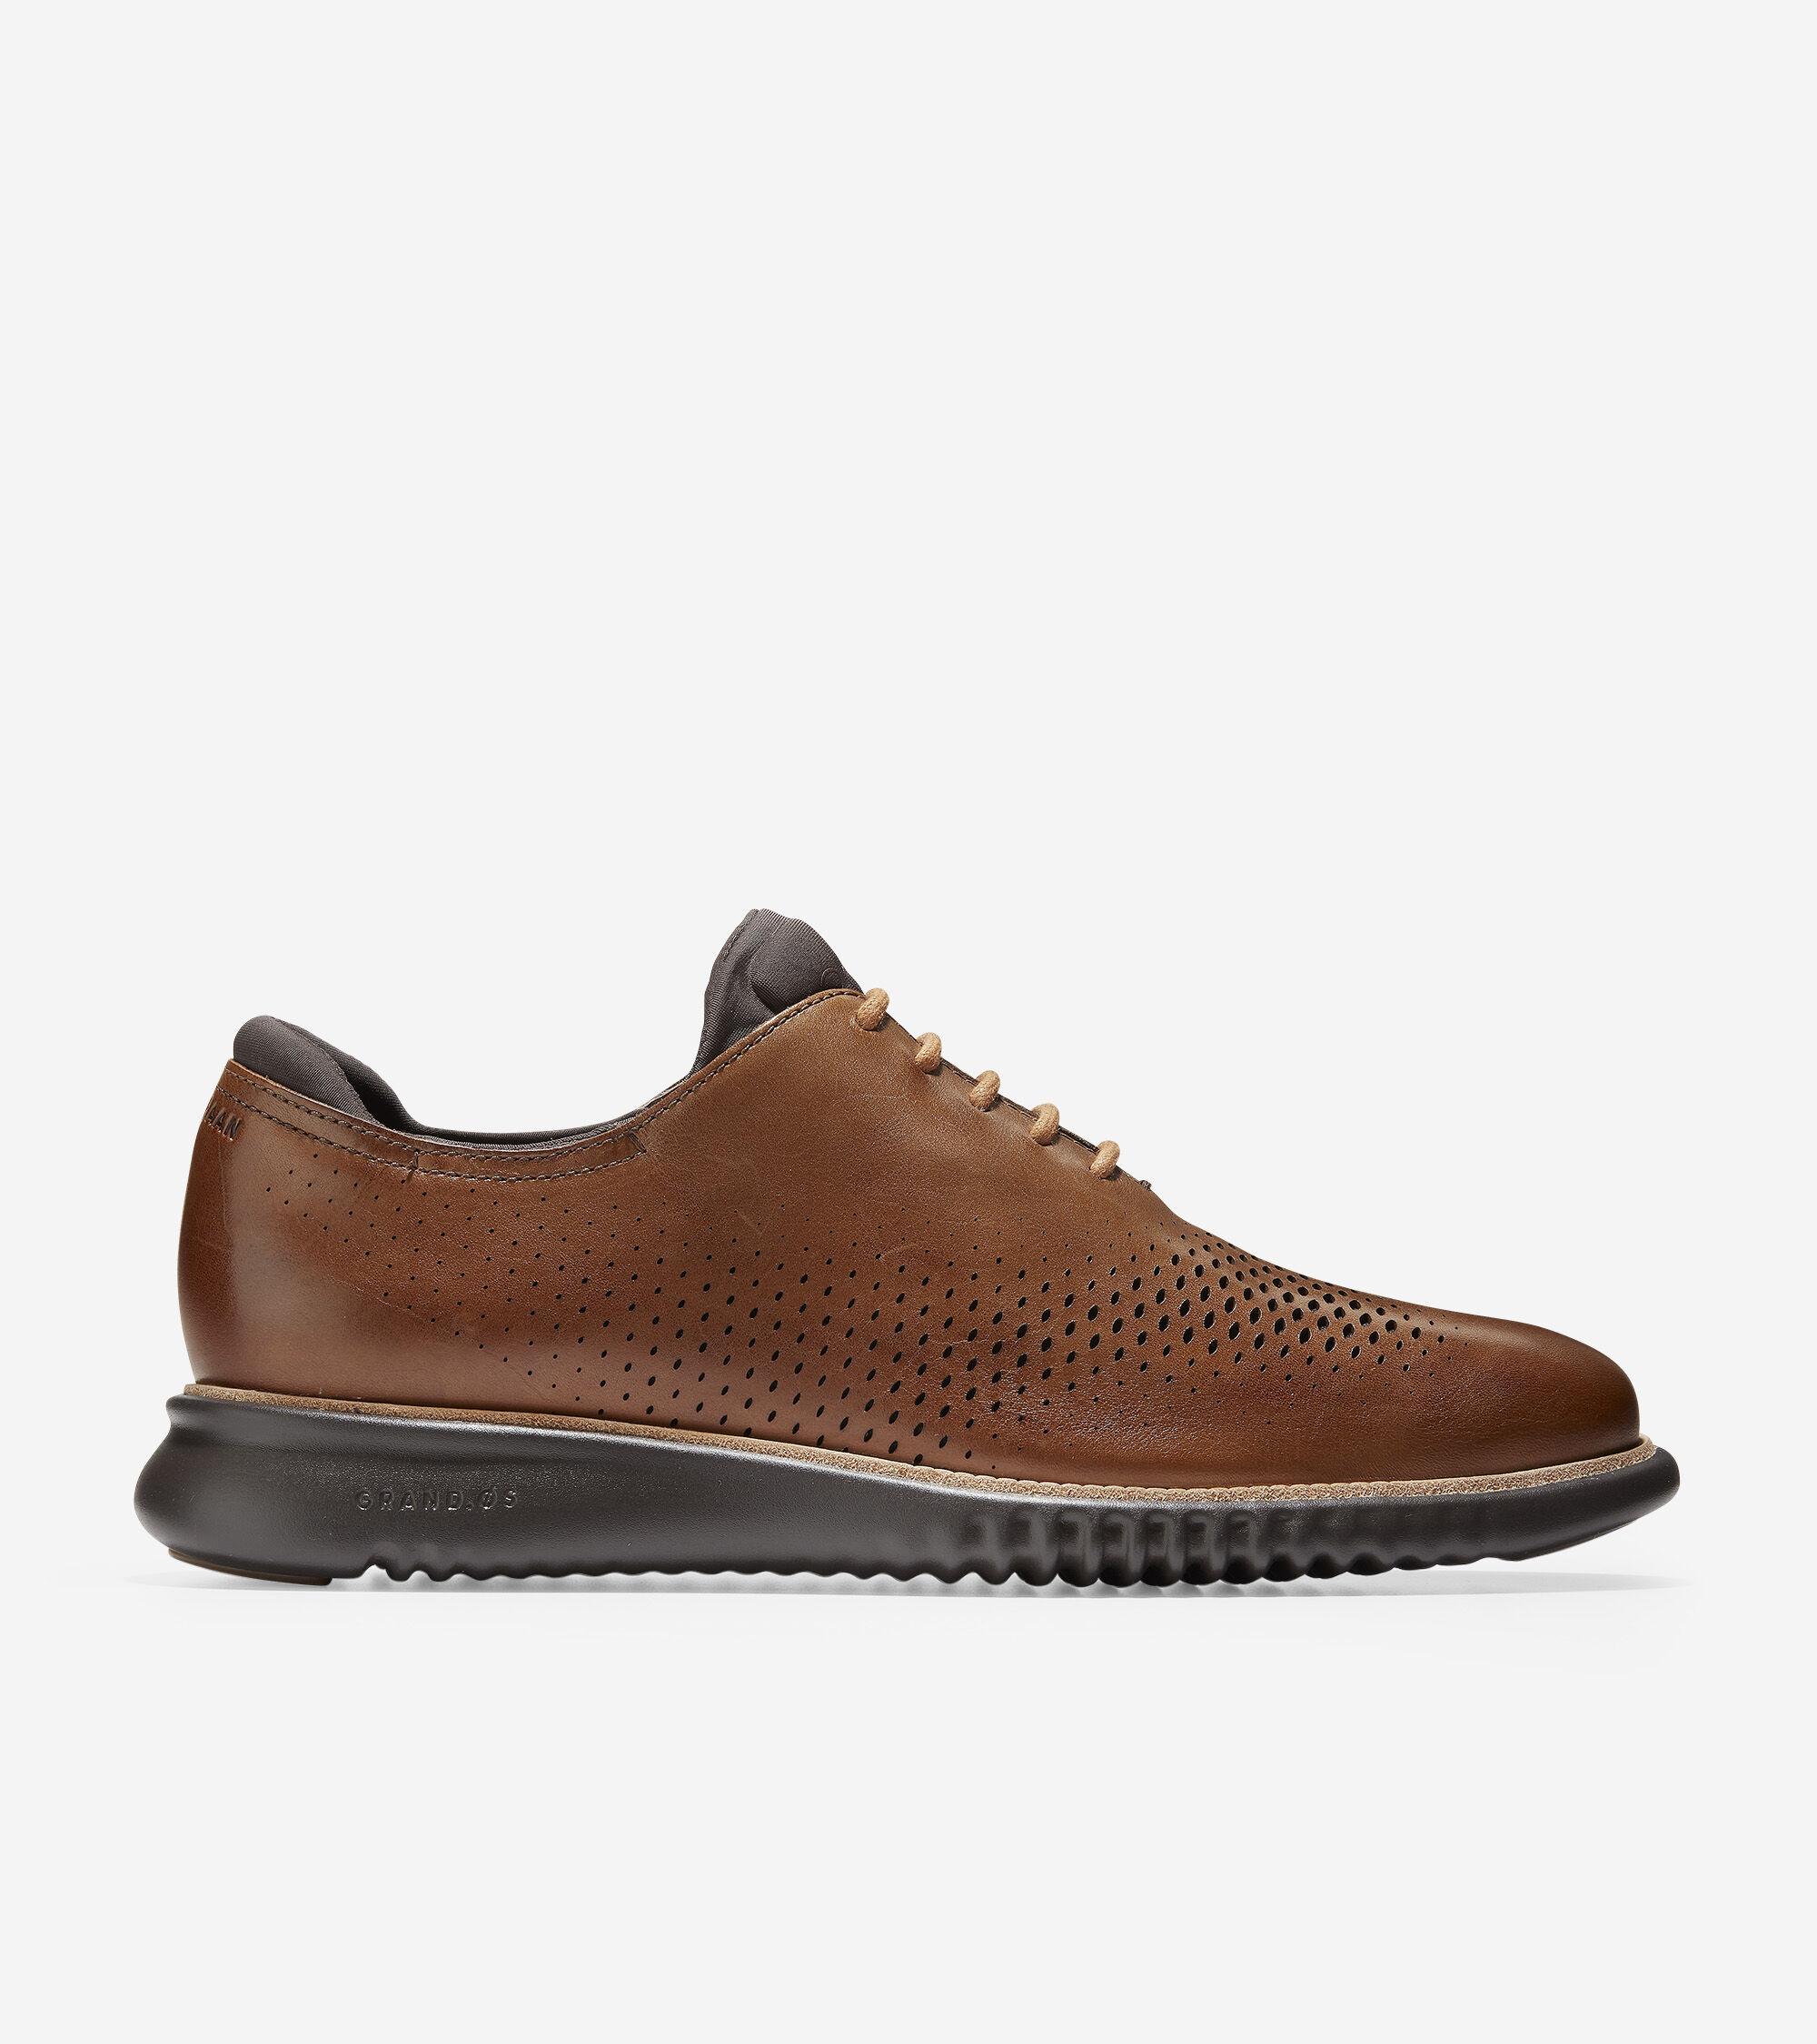 Cole Haan 2.ZEROGRAND Laser Wingtip Oxford Shoes